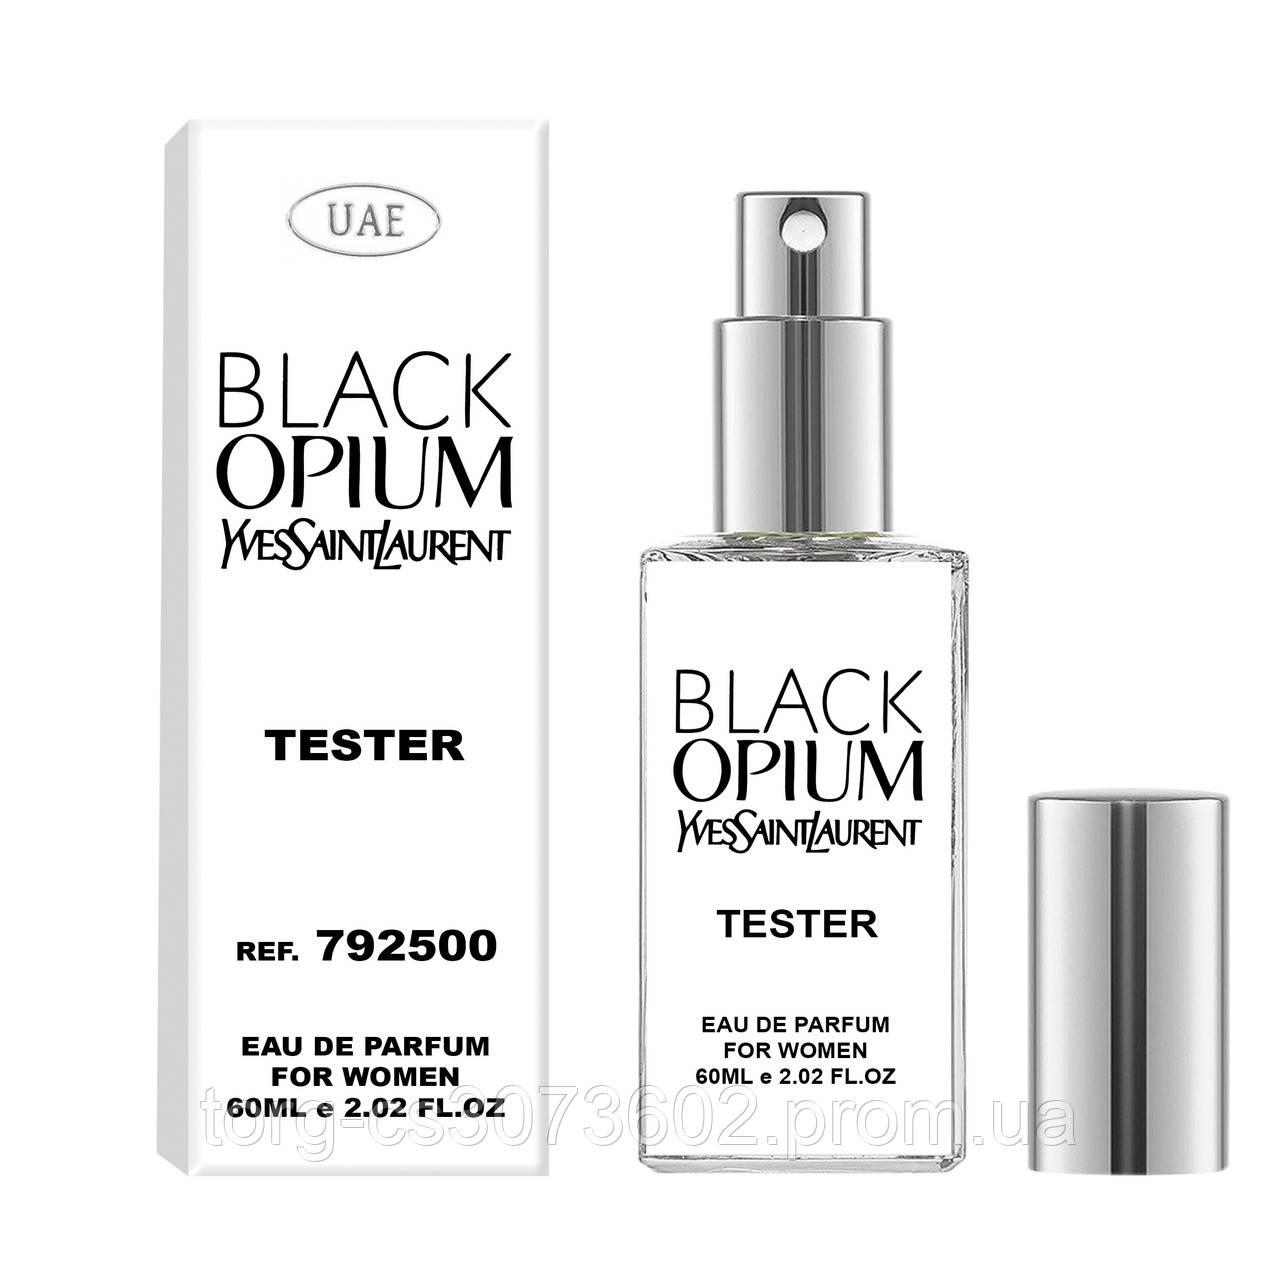 Тестер женский  UAE Yves Saint Laurent Black Opium, 60 мл.